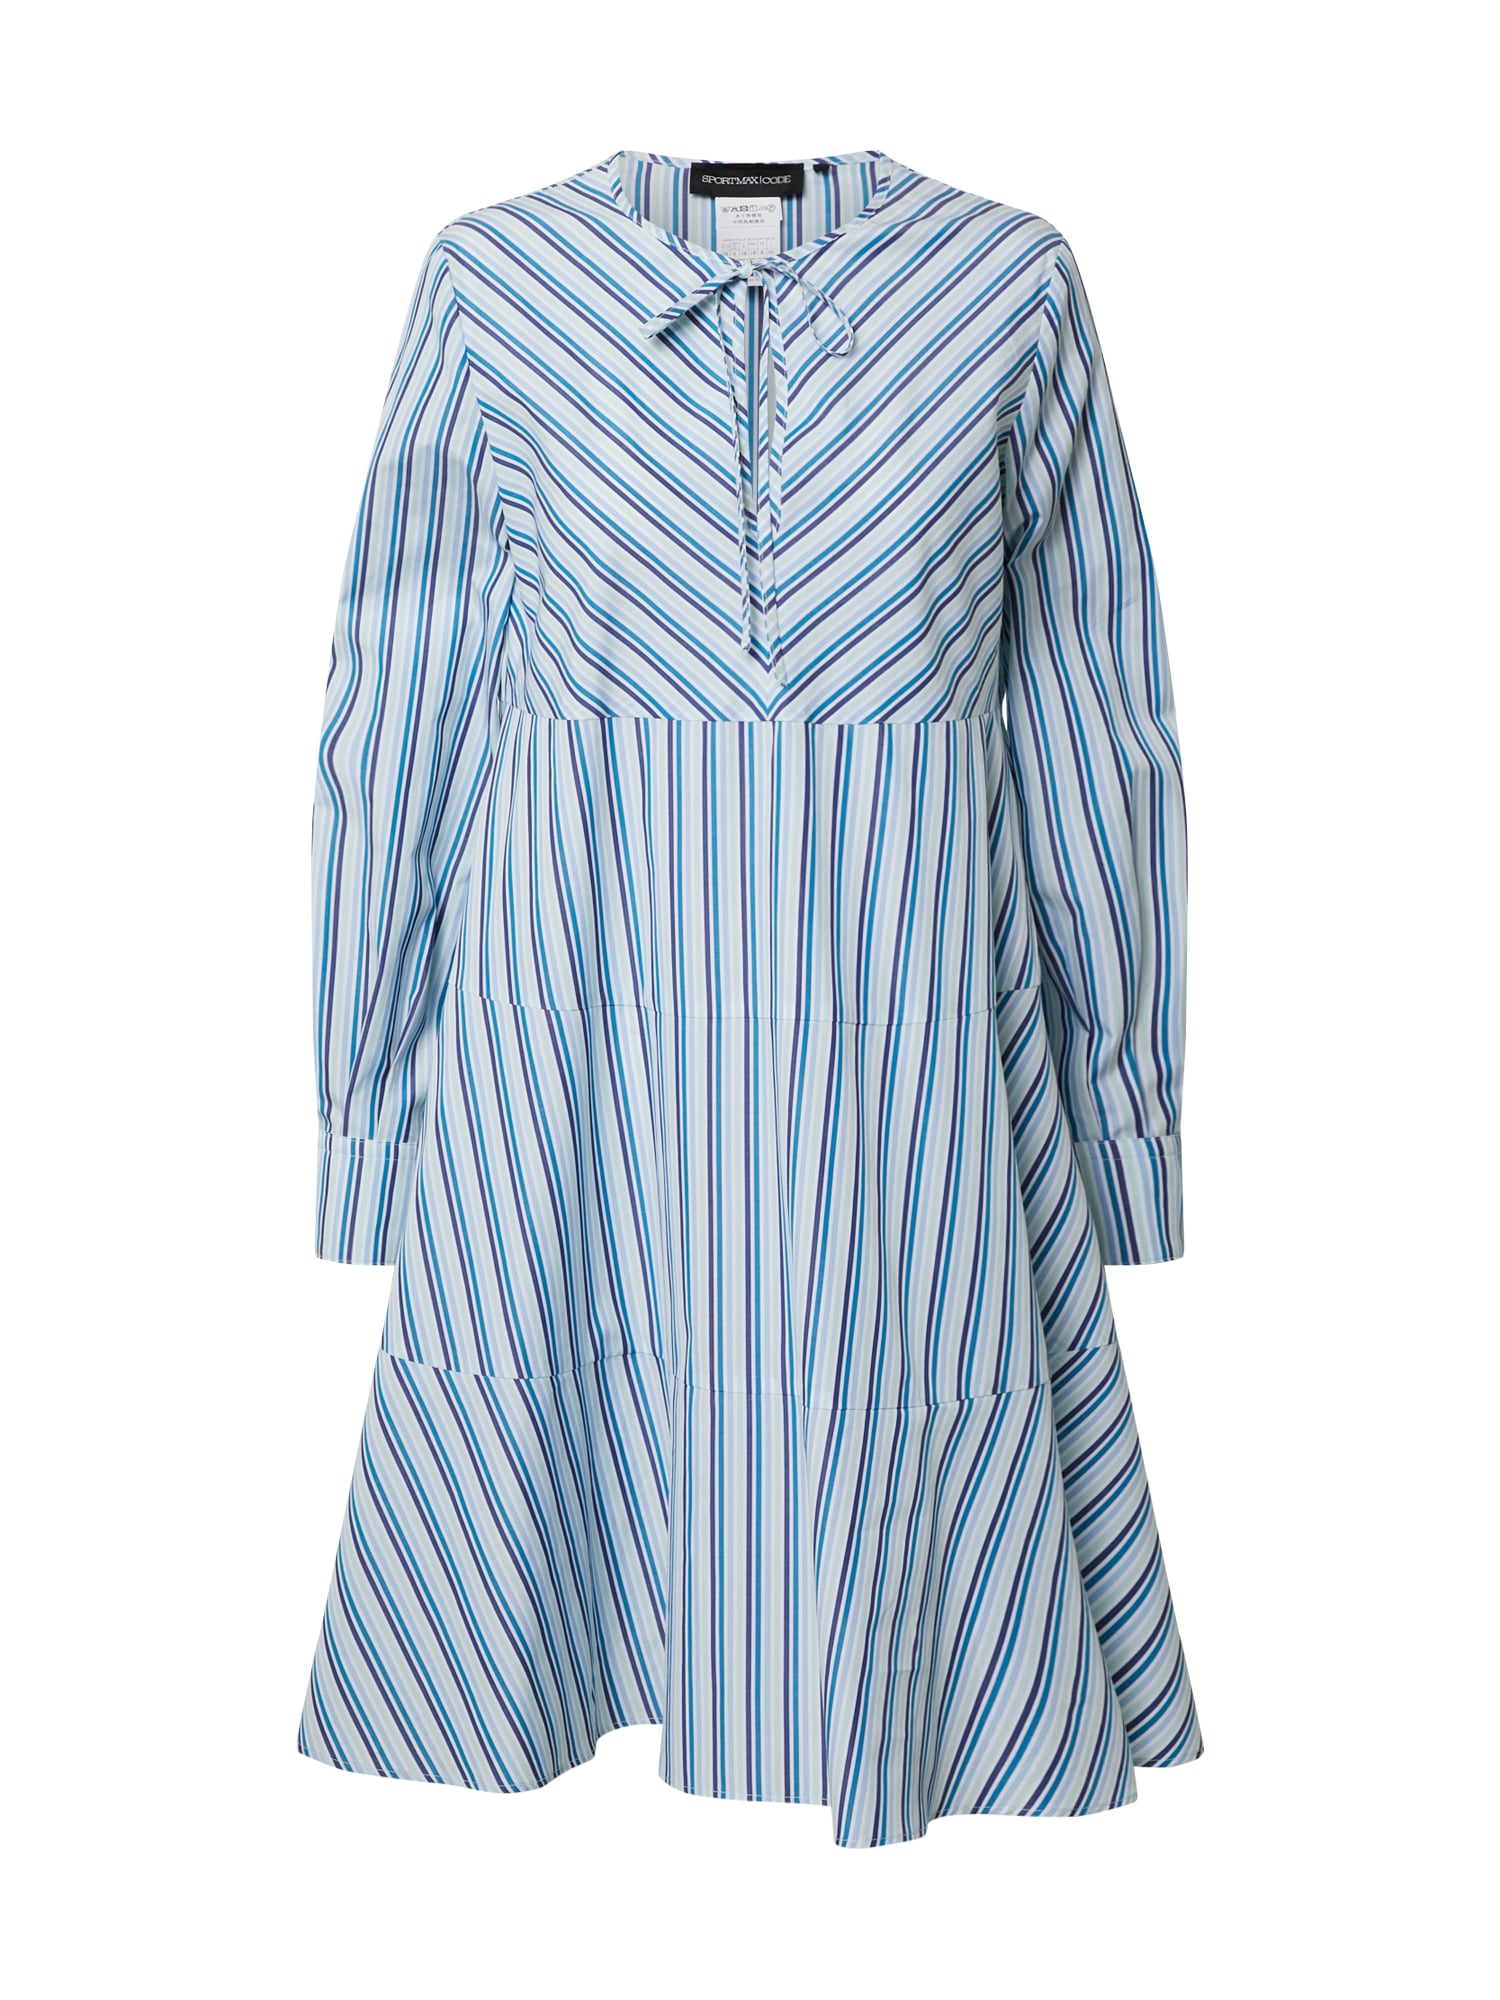 Sportmax Code Košilové šaty 'Abbono'  modrá / bílá / tmavě fialová